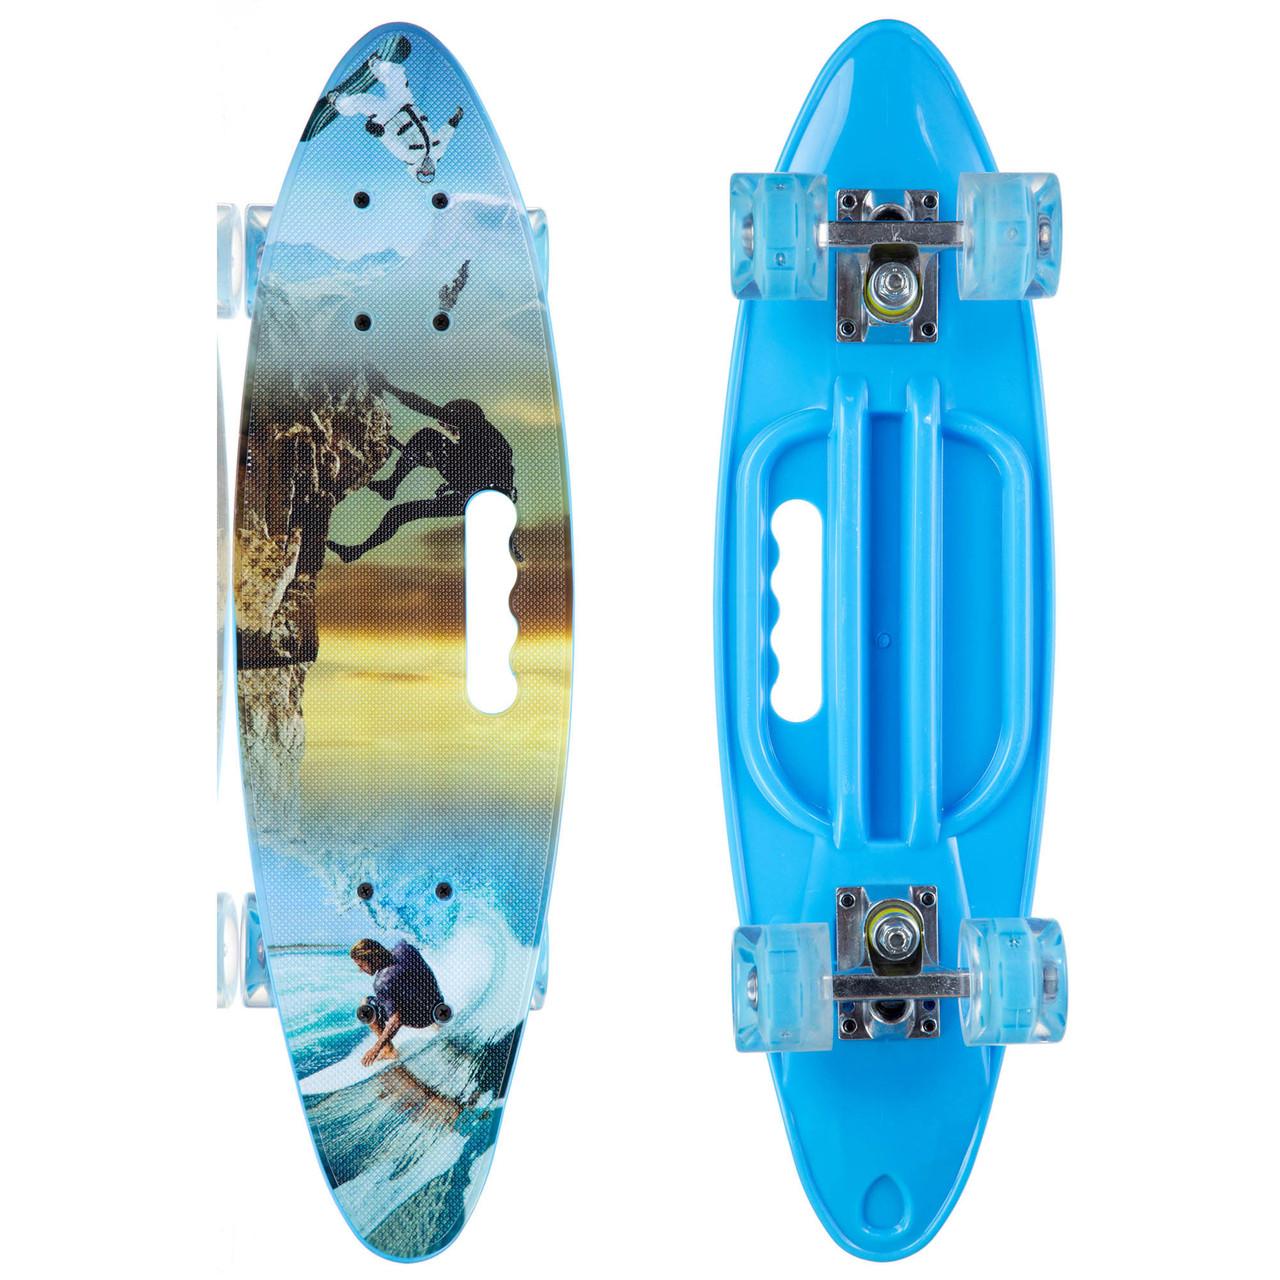 Скейтборд круизер SK-885-5 (синий)